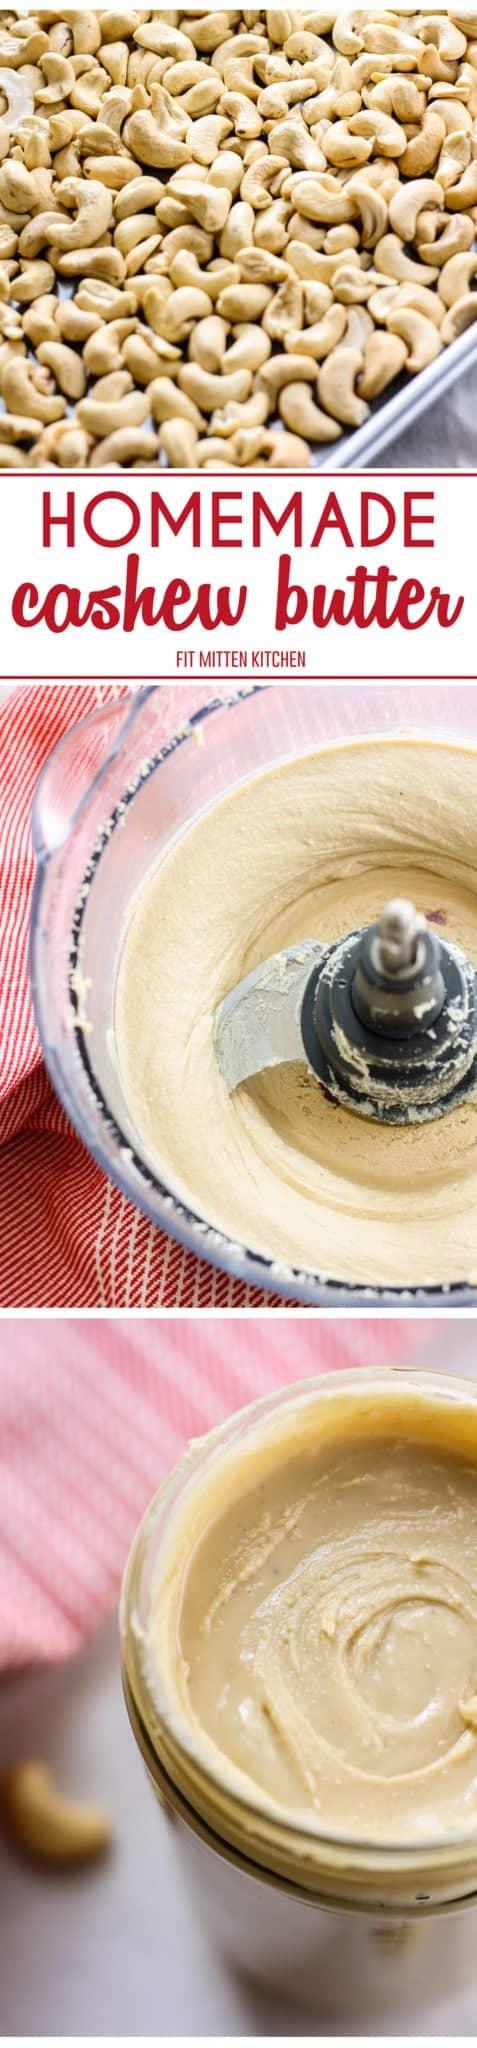 steps to make Homemade Cashew Butter